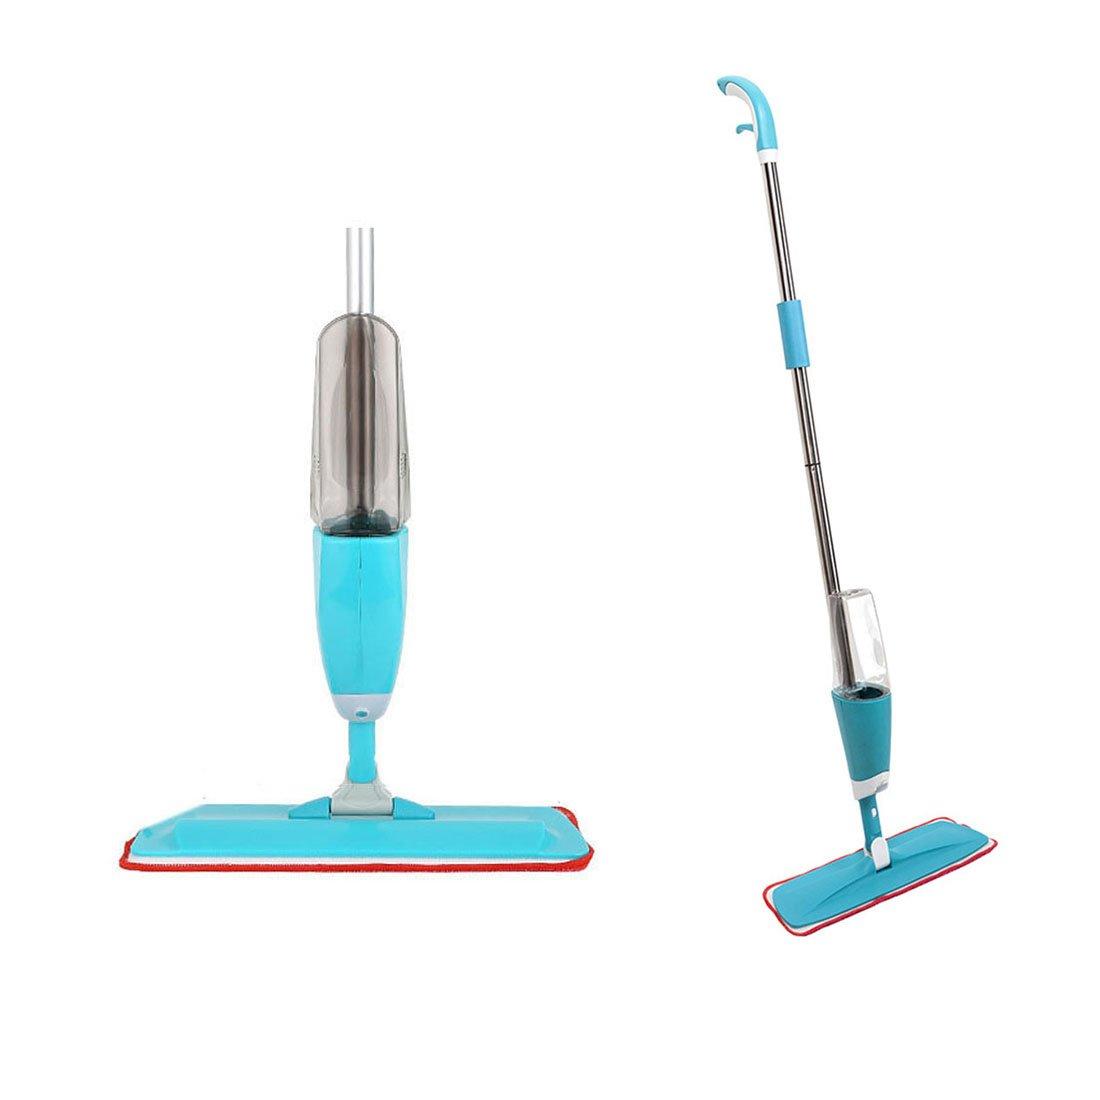 Wenosda Floor Cleaner Mop Microfiber Water Mist Floor Mop With Integrated Spraying for House, Kitchen, Hardwood (Blue)